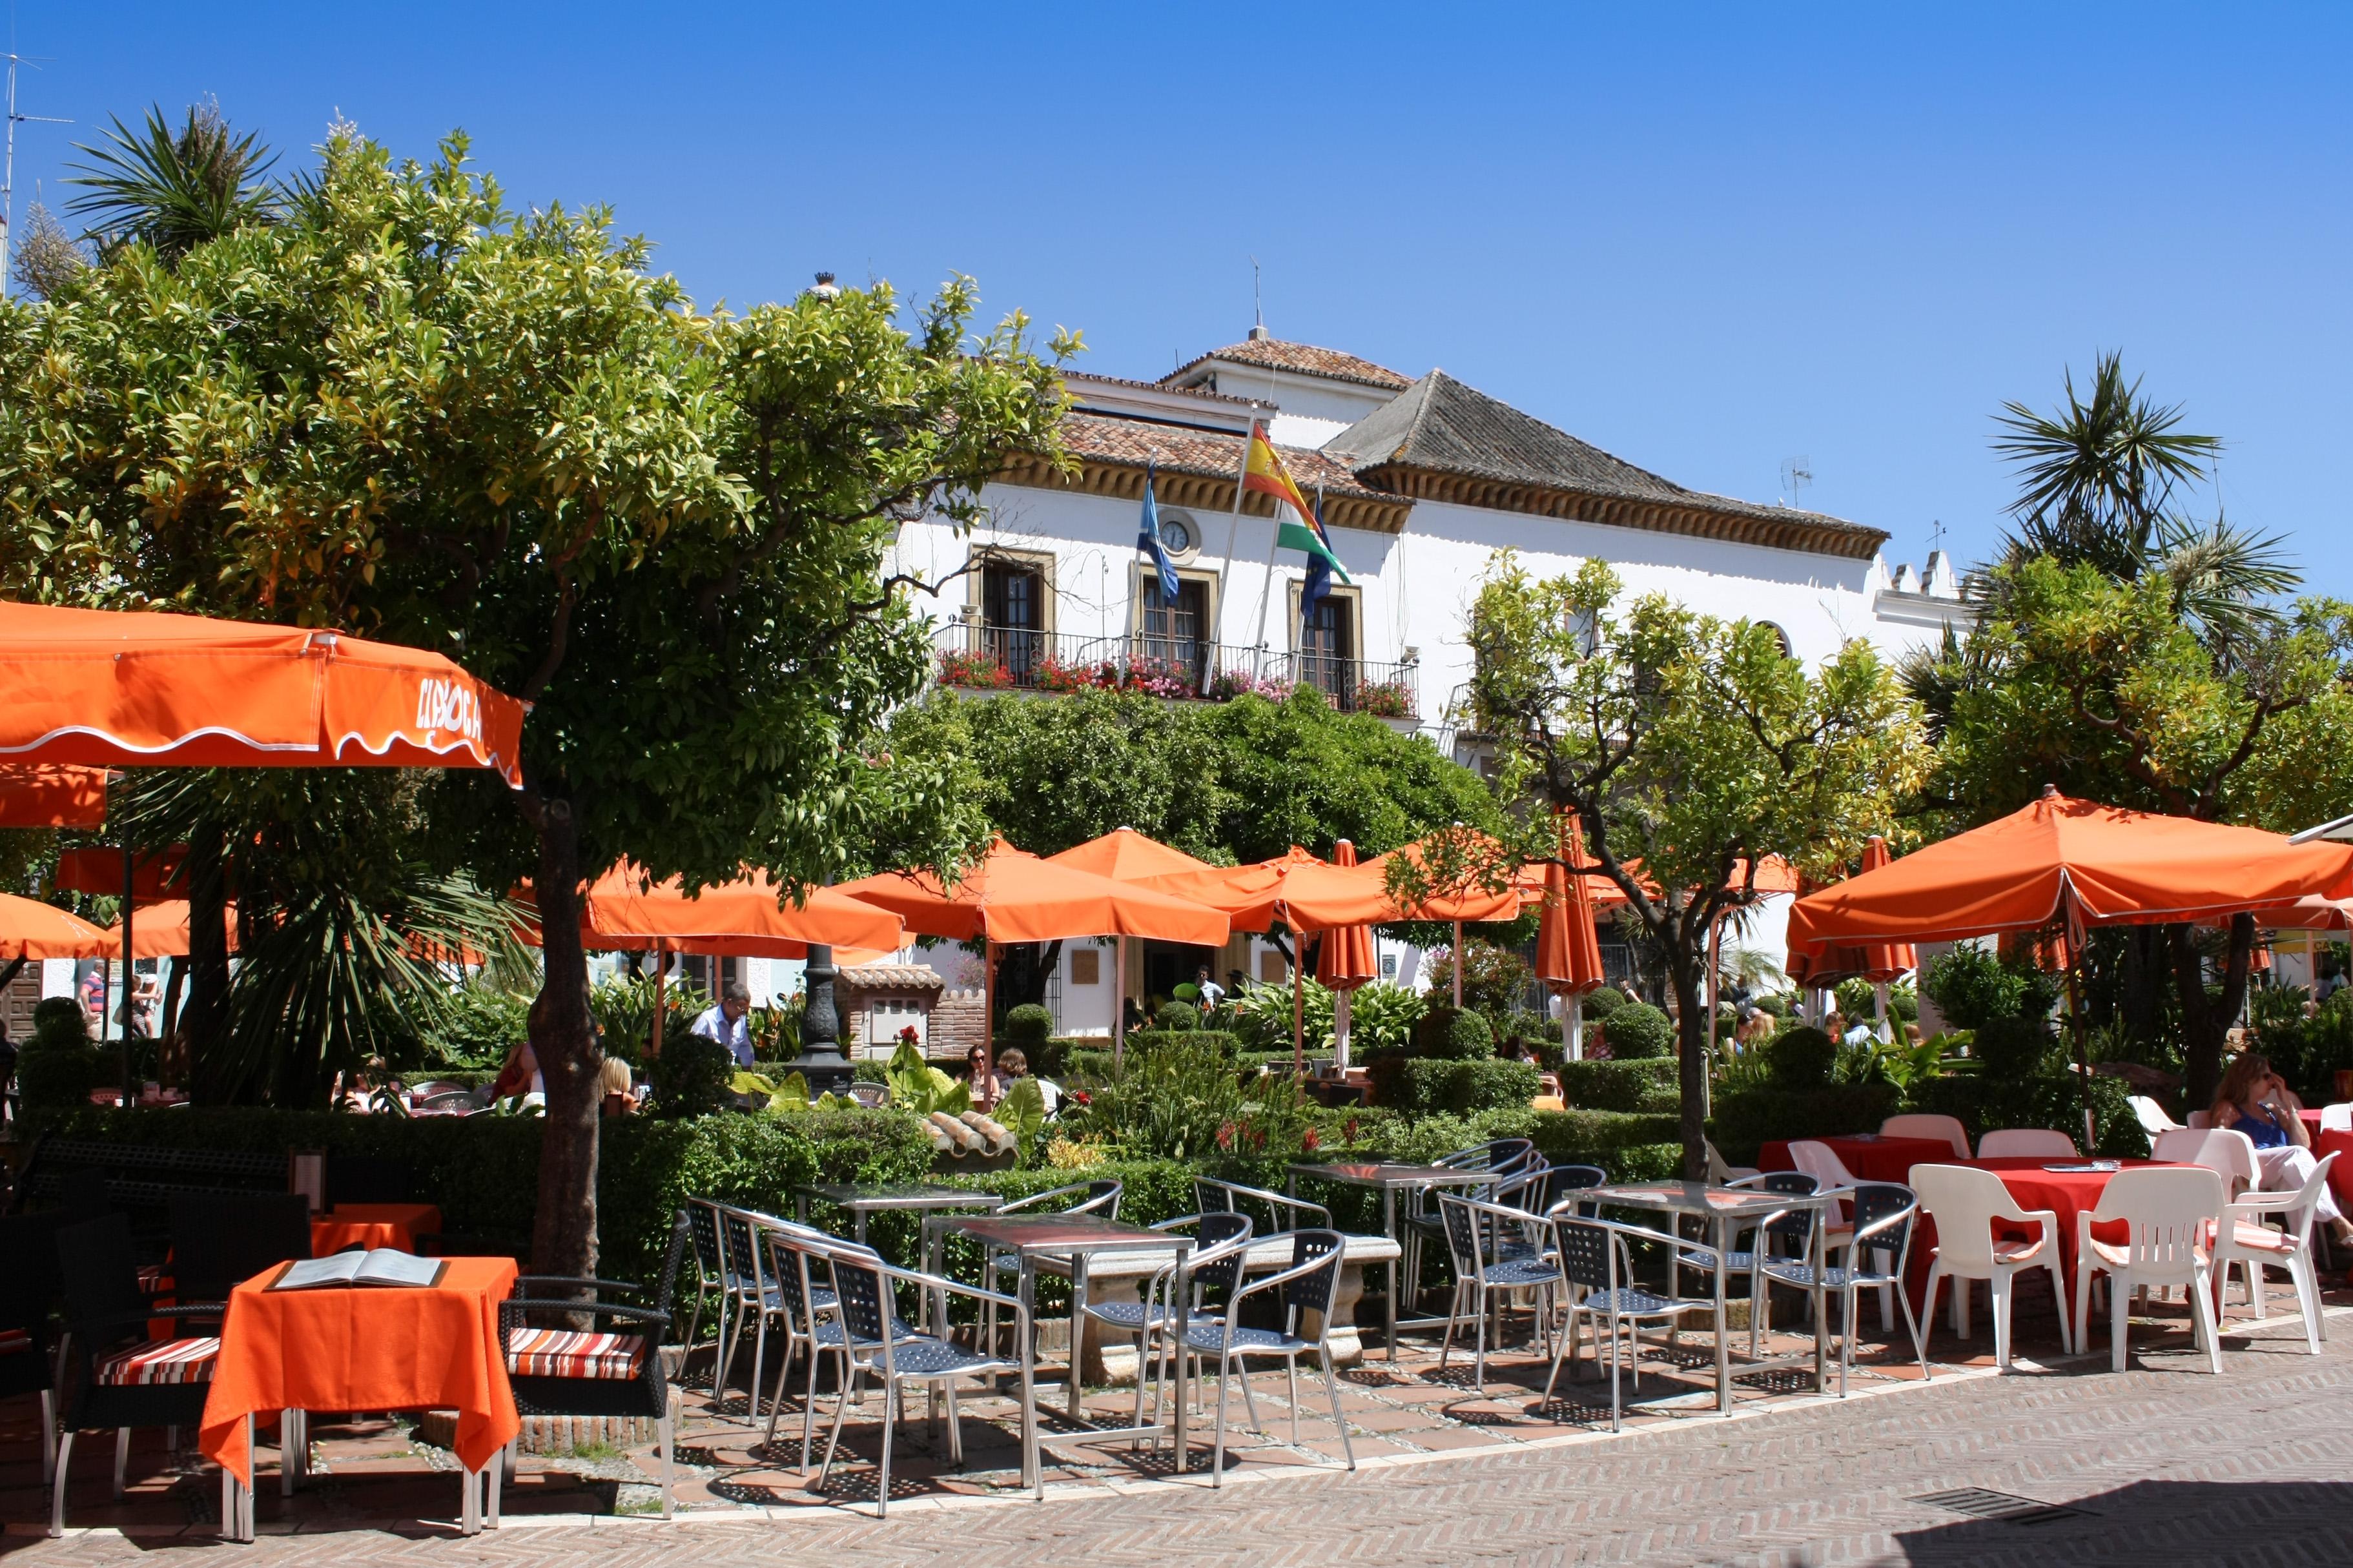 Marbella Restaurants On The Beach